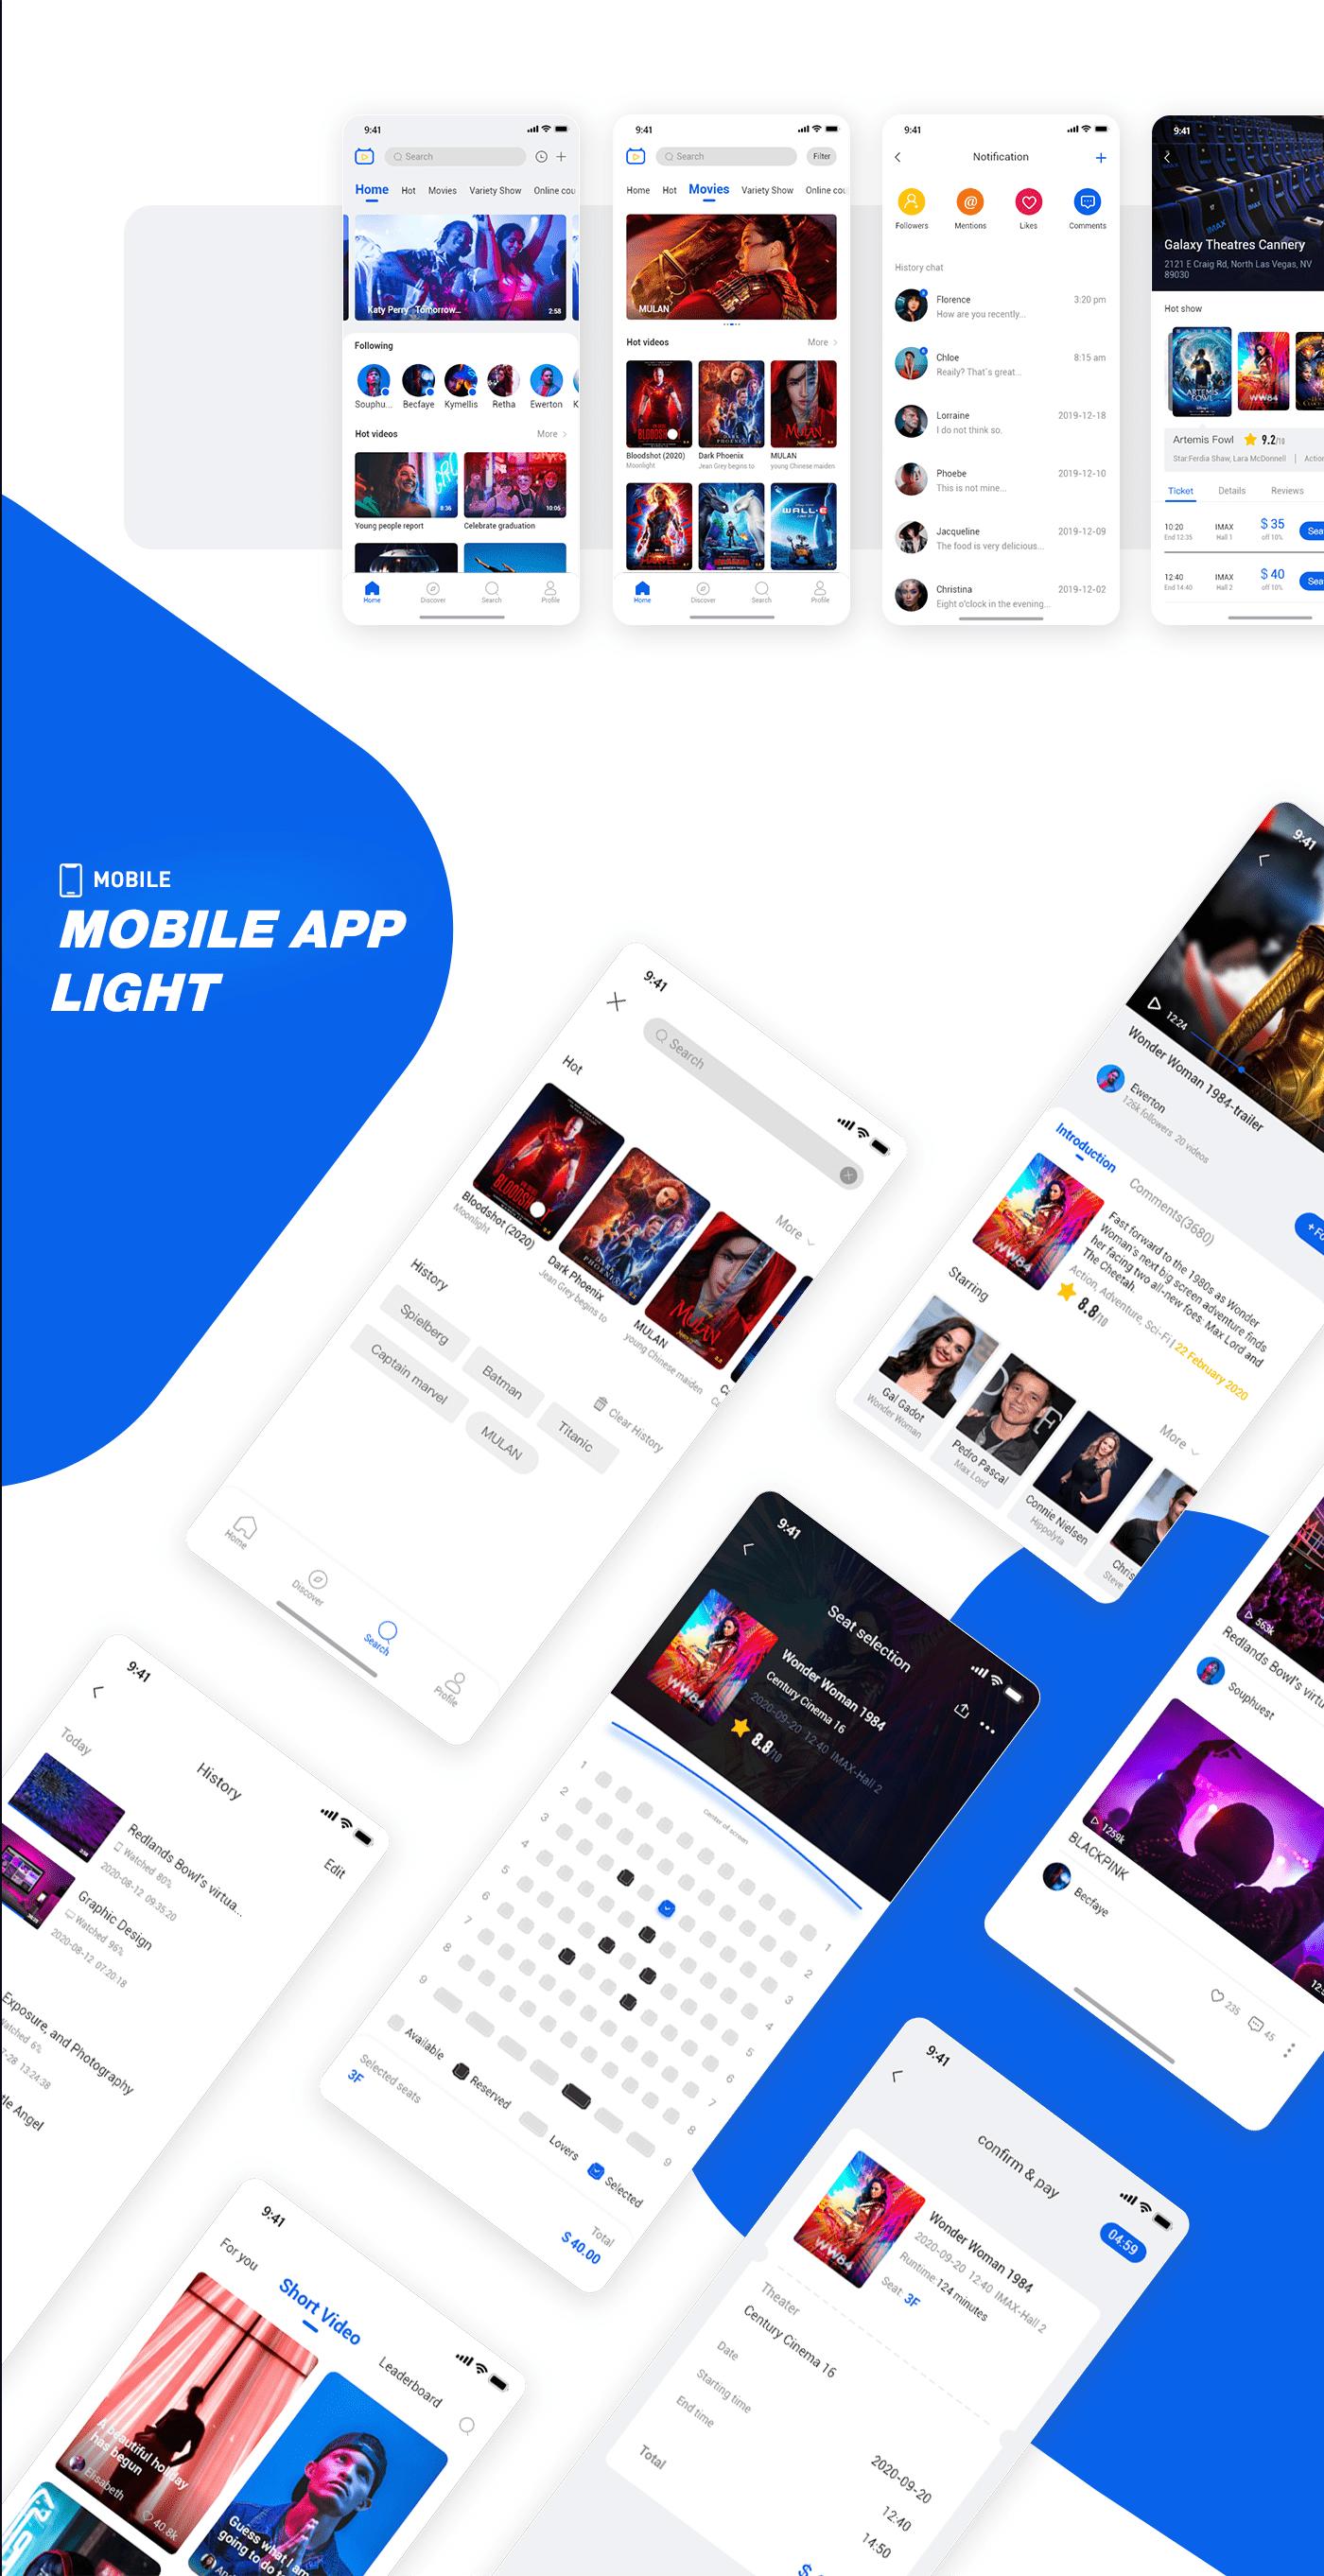 دانلود اپلیکیشن و پلتفرم Video Sharing Platform